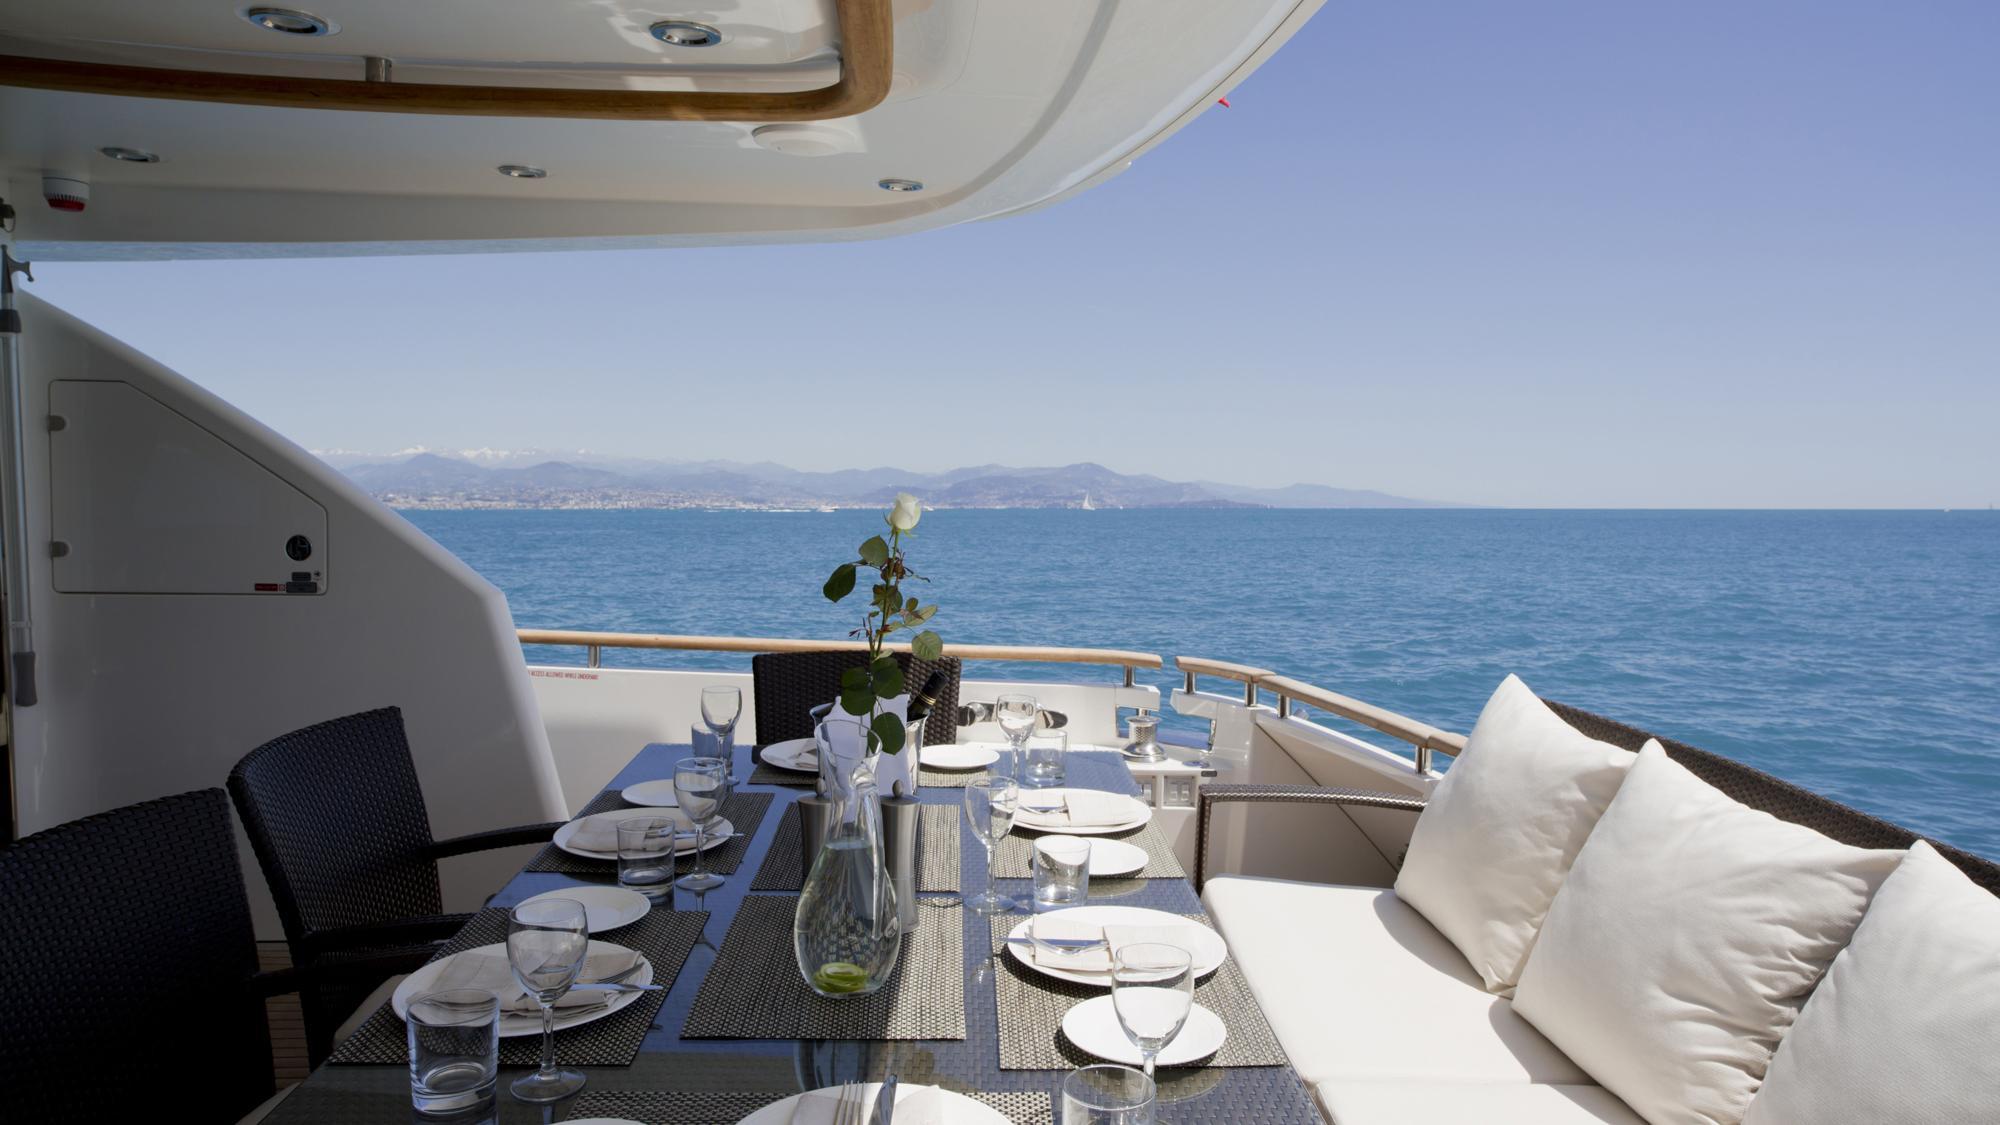 D5-yacht-aft-dining